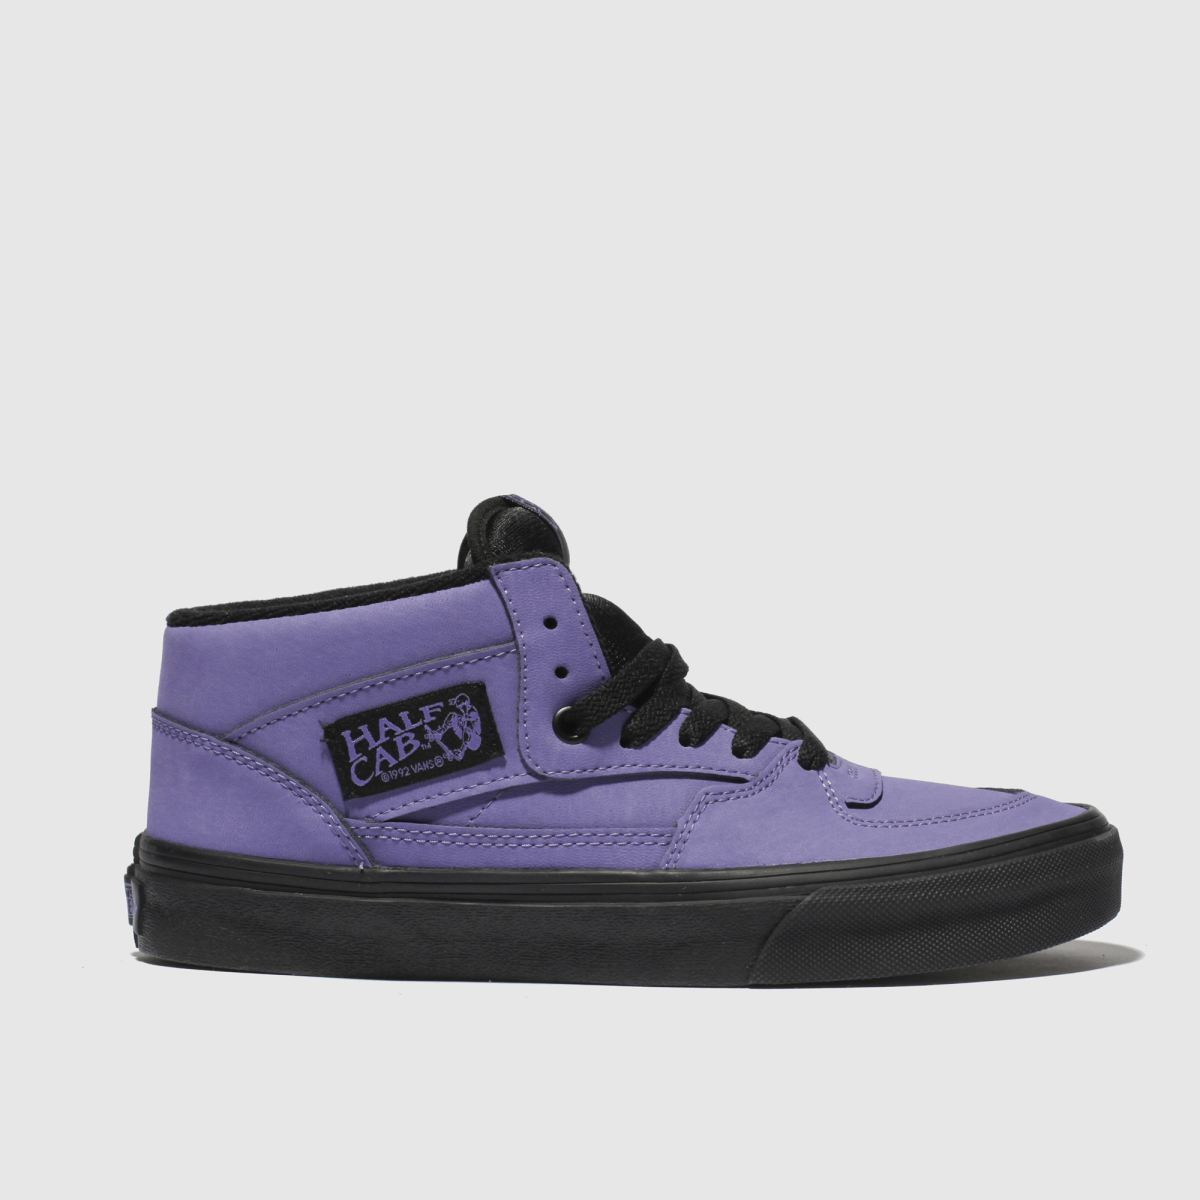 Vans Purple Half Cab Trainers